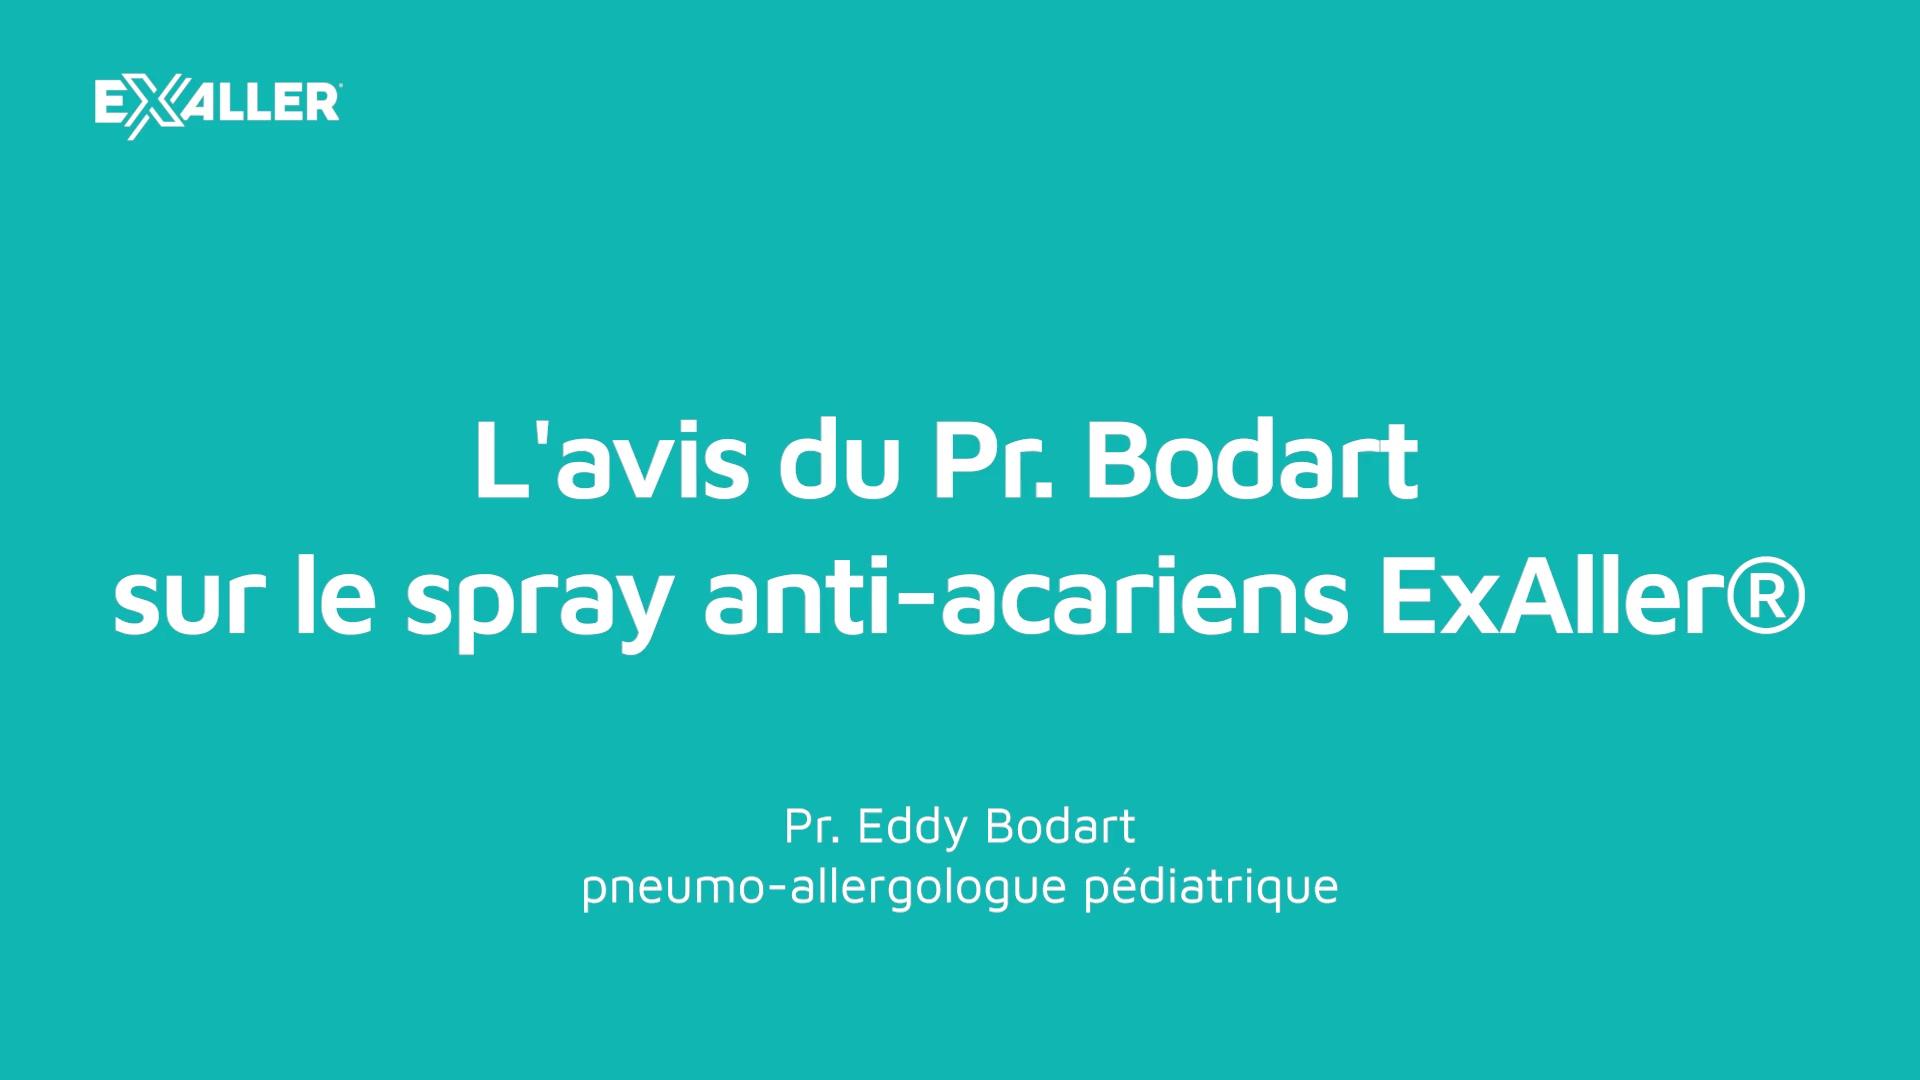 E4 Lavis du Pr. Bodart sur le spray anti-acariens ExAller